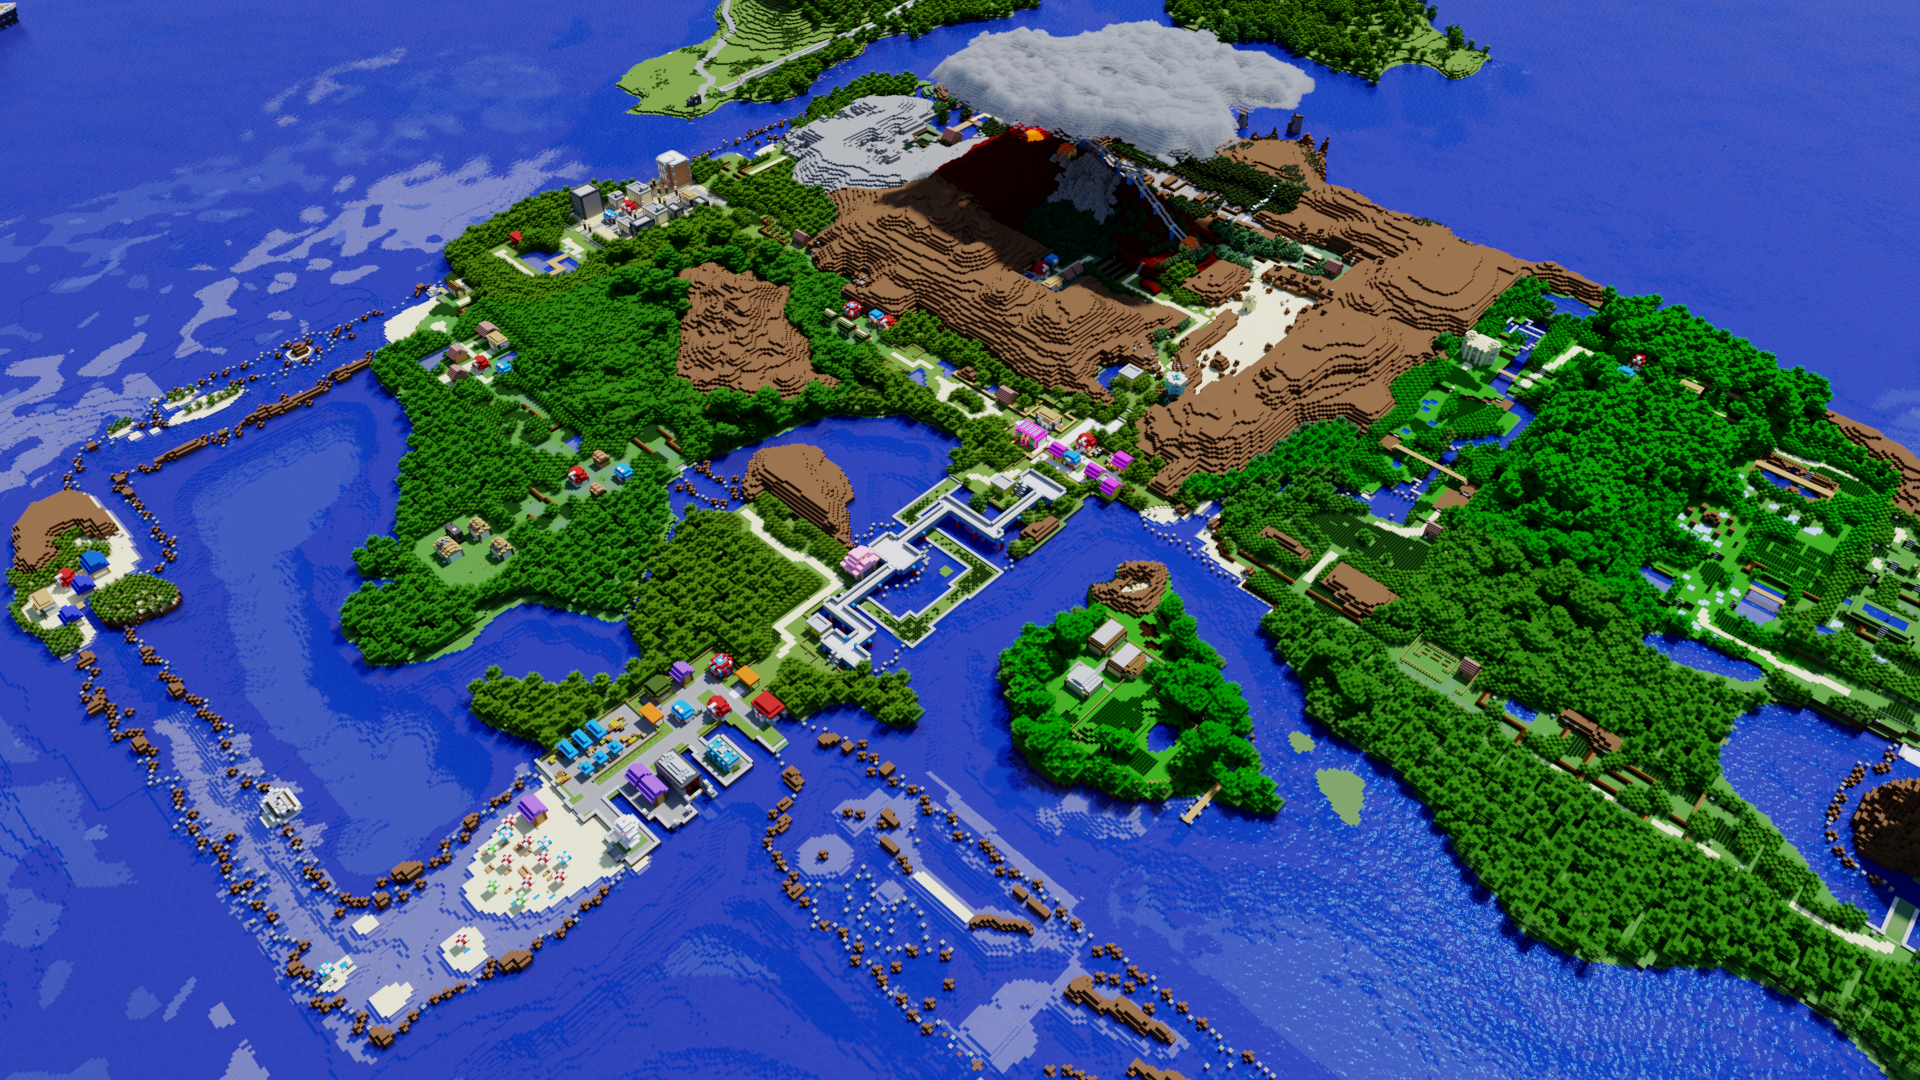 Jeux Vidéo Minecraft Pokémon Fond D'écran